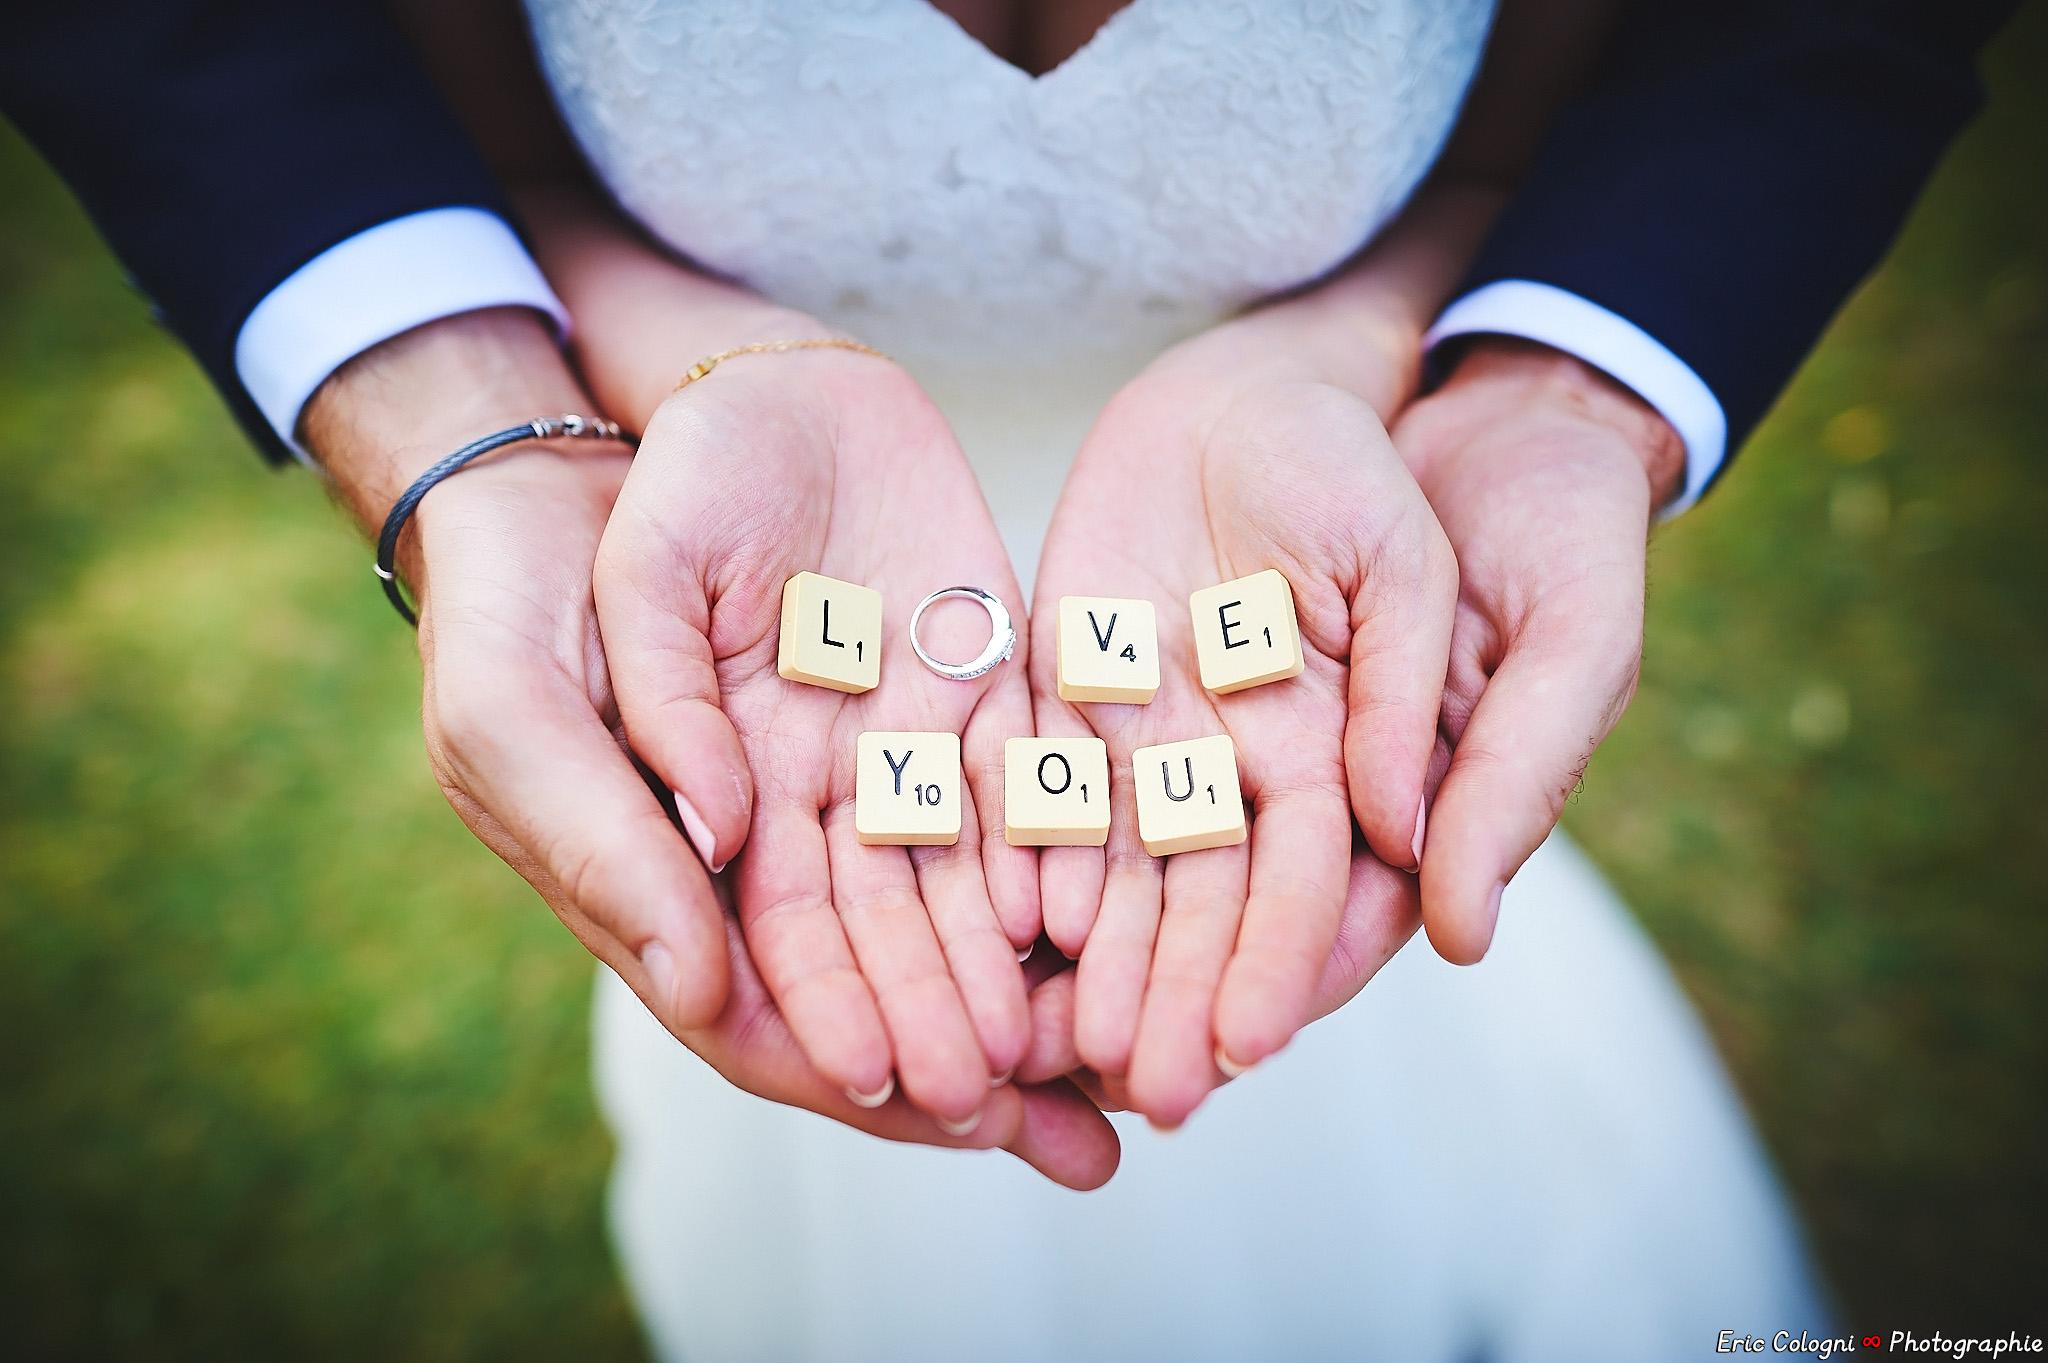 Liste de mariage Printemps - Zankyou | Blog mariage La Mariée Sous Les Etoiles